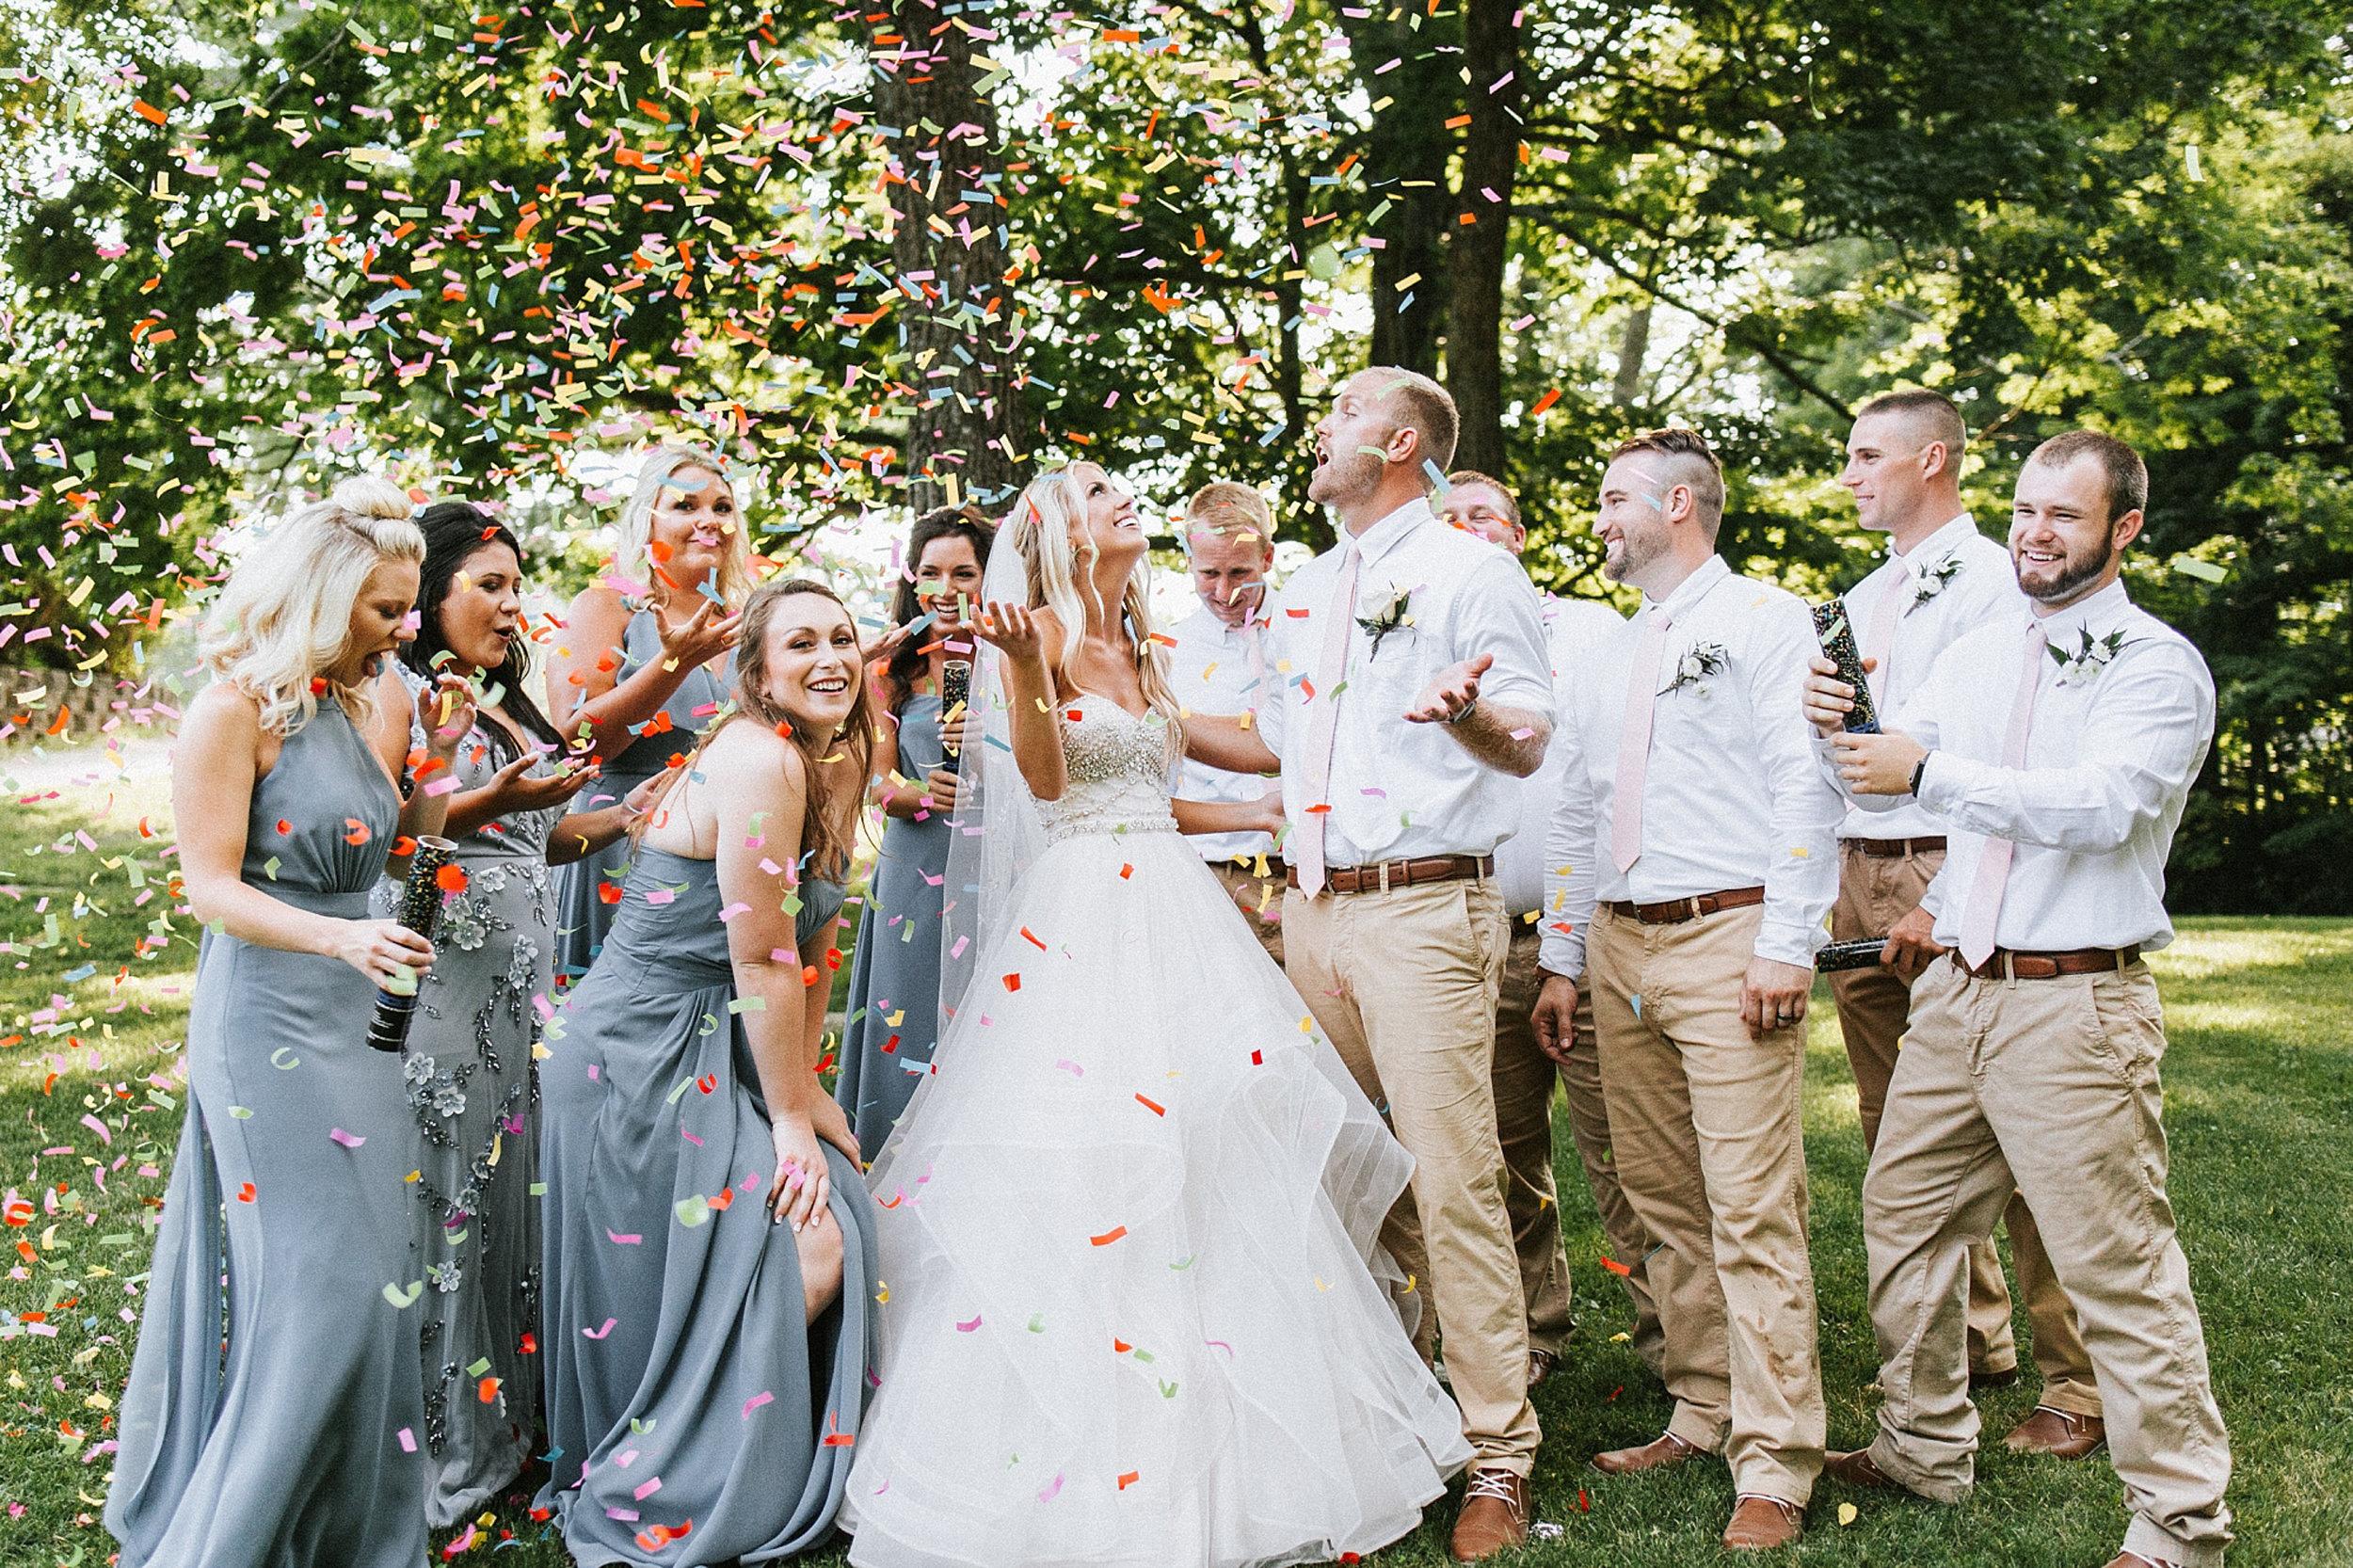 Brooke Townsend Photography - Cincinnati Wedding Photographer (90 of 153).jpg